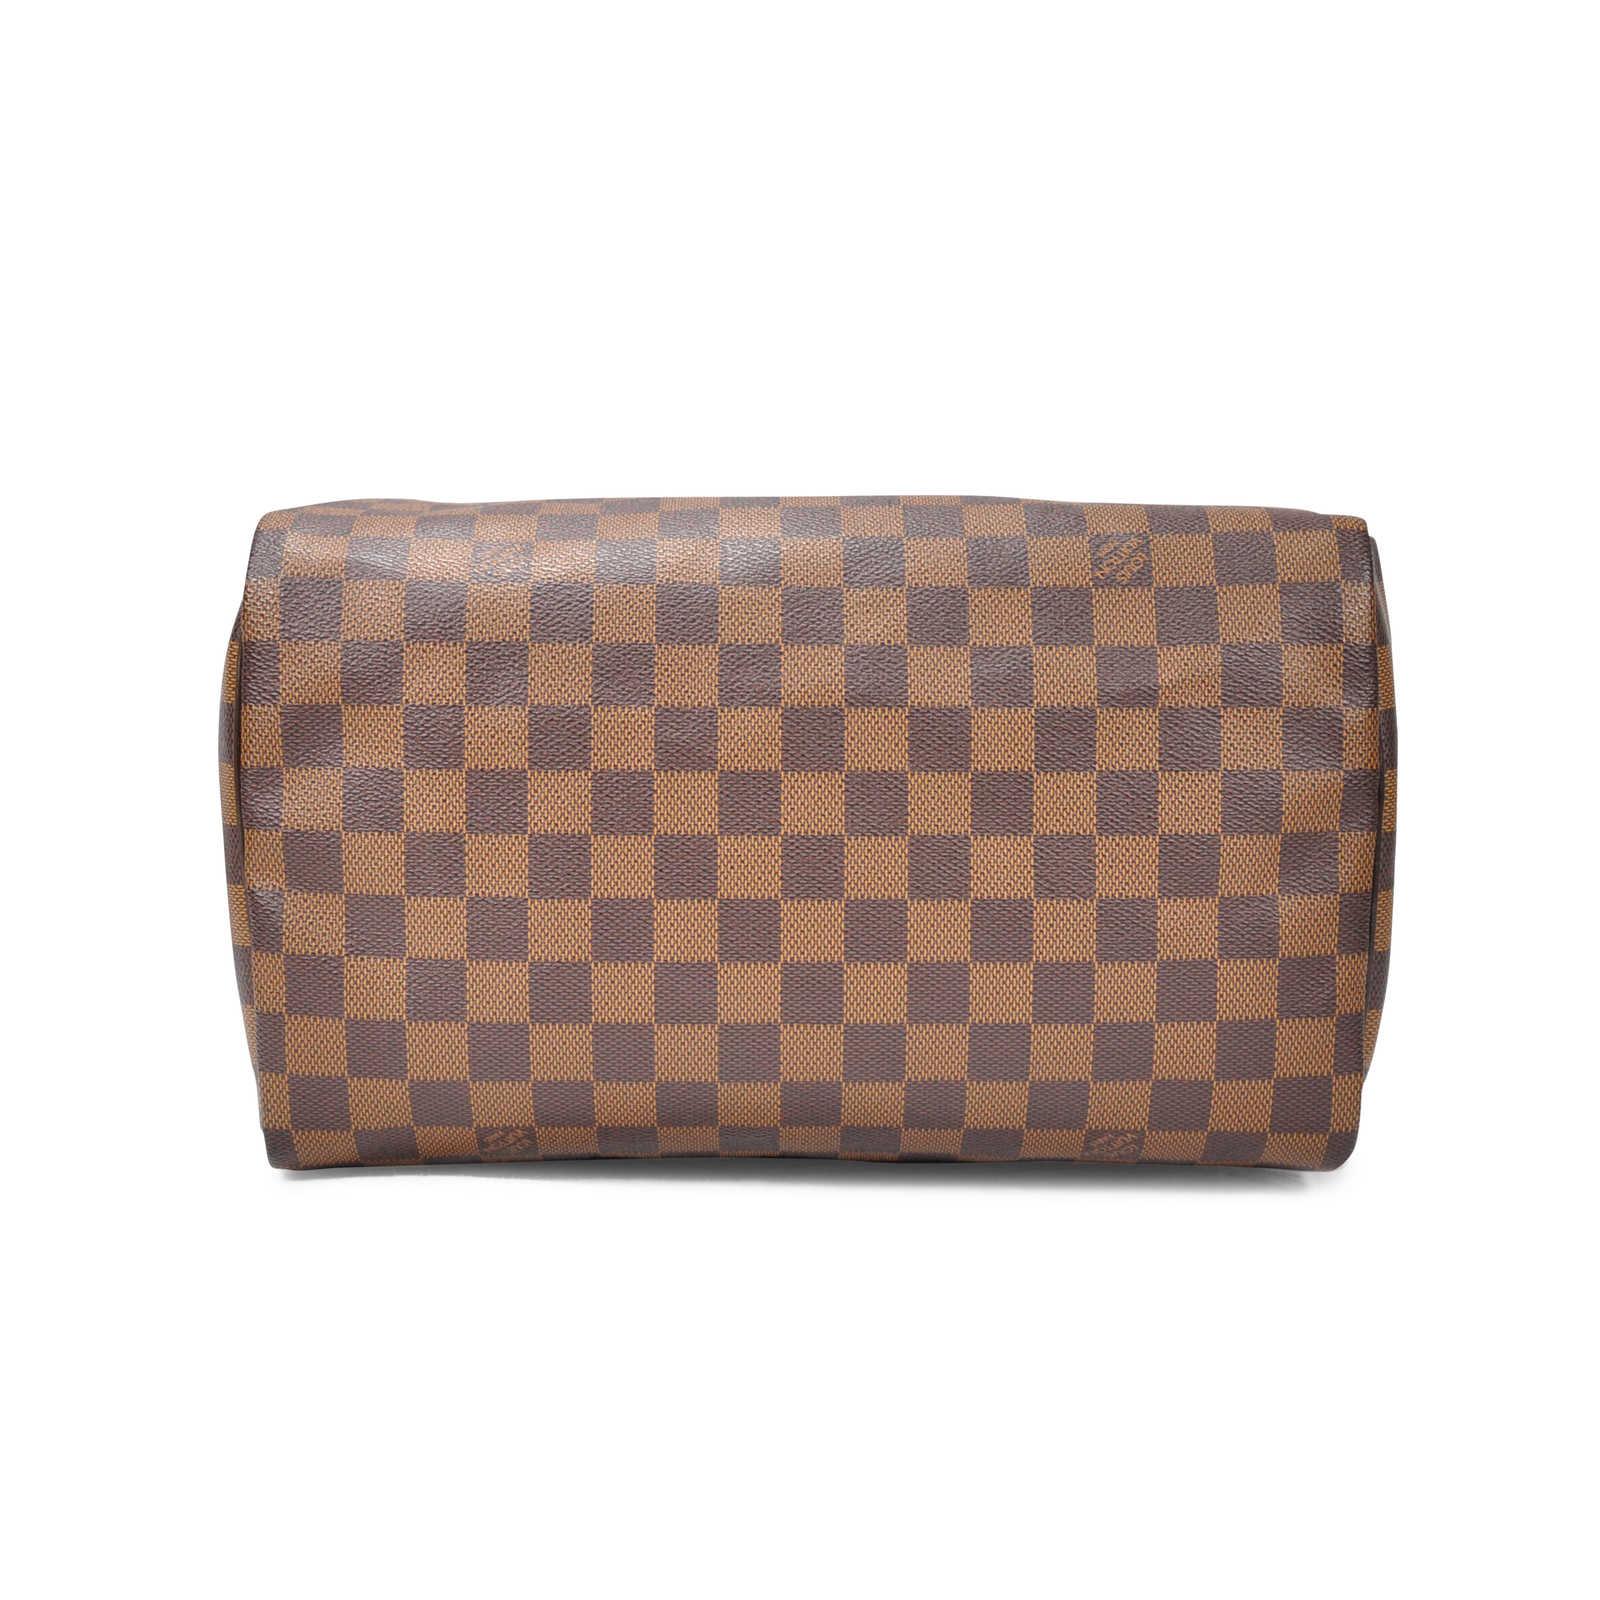 3304b243d9b0 ... Authentic Second Hand Louis Vuitton Damier Speedy 30 (PSS-274-00001) ...